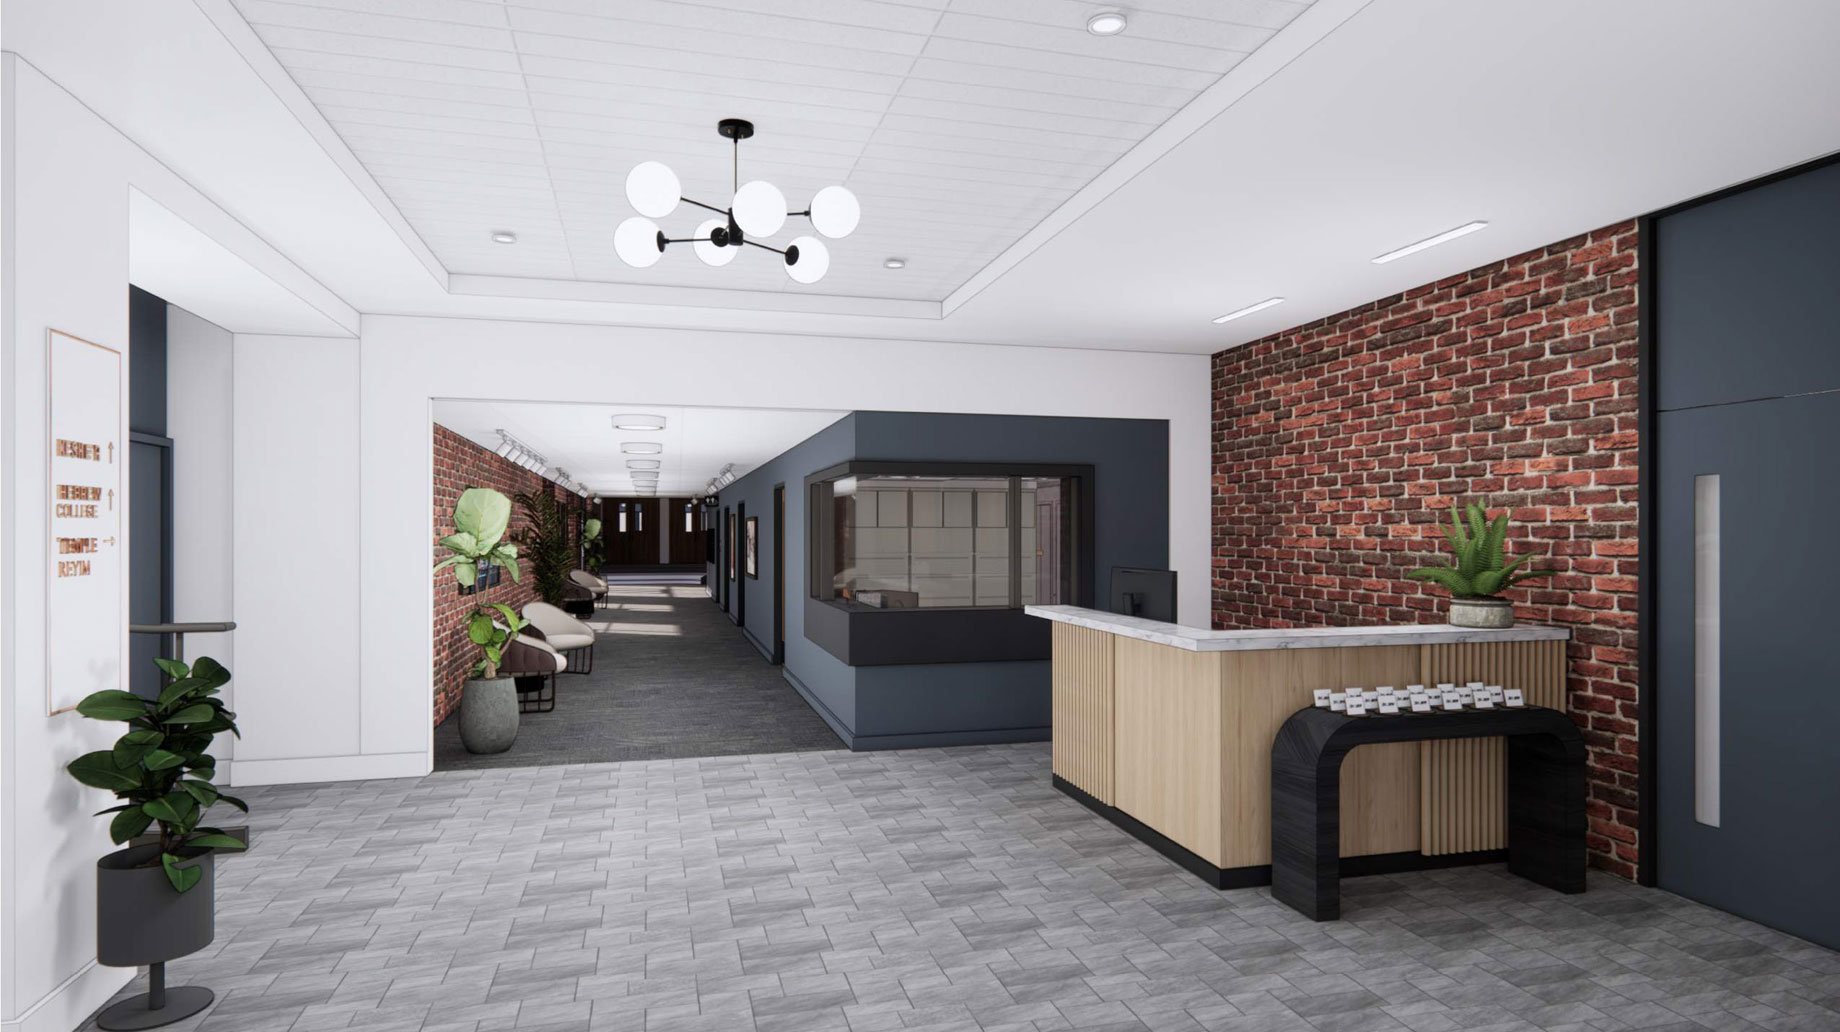 new building lobby rendering